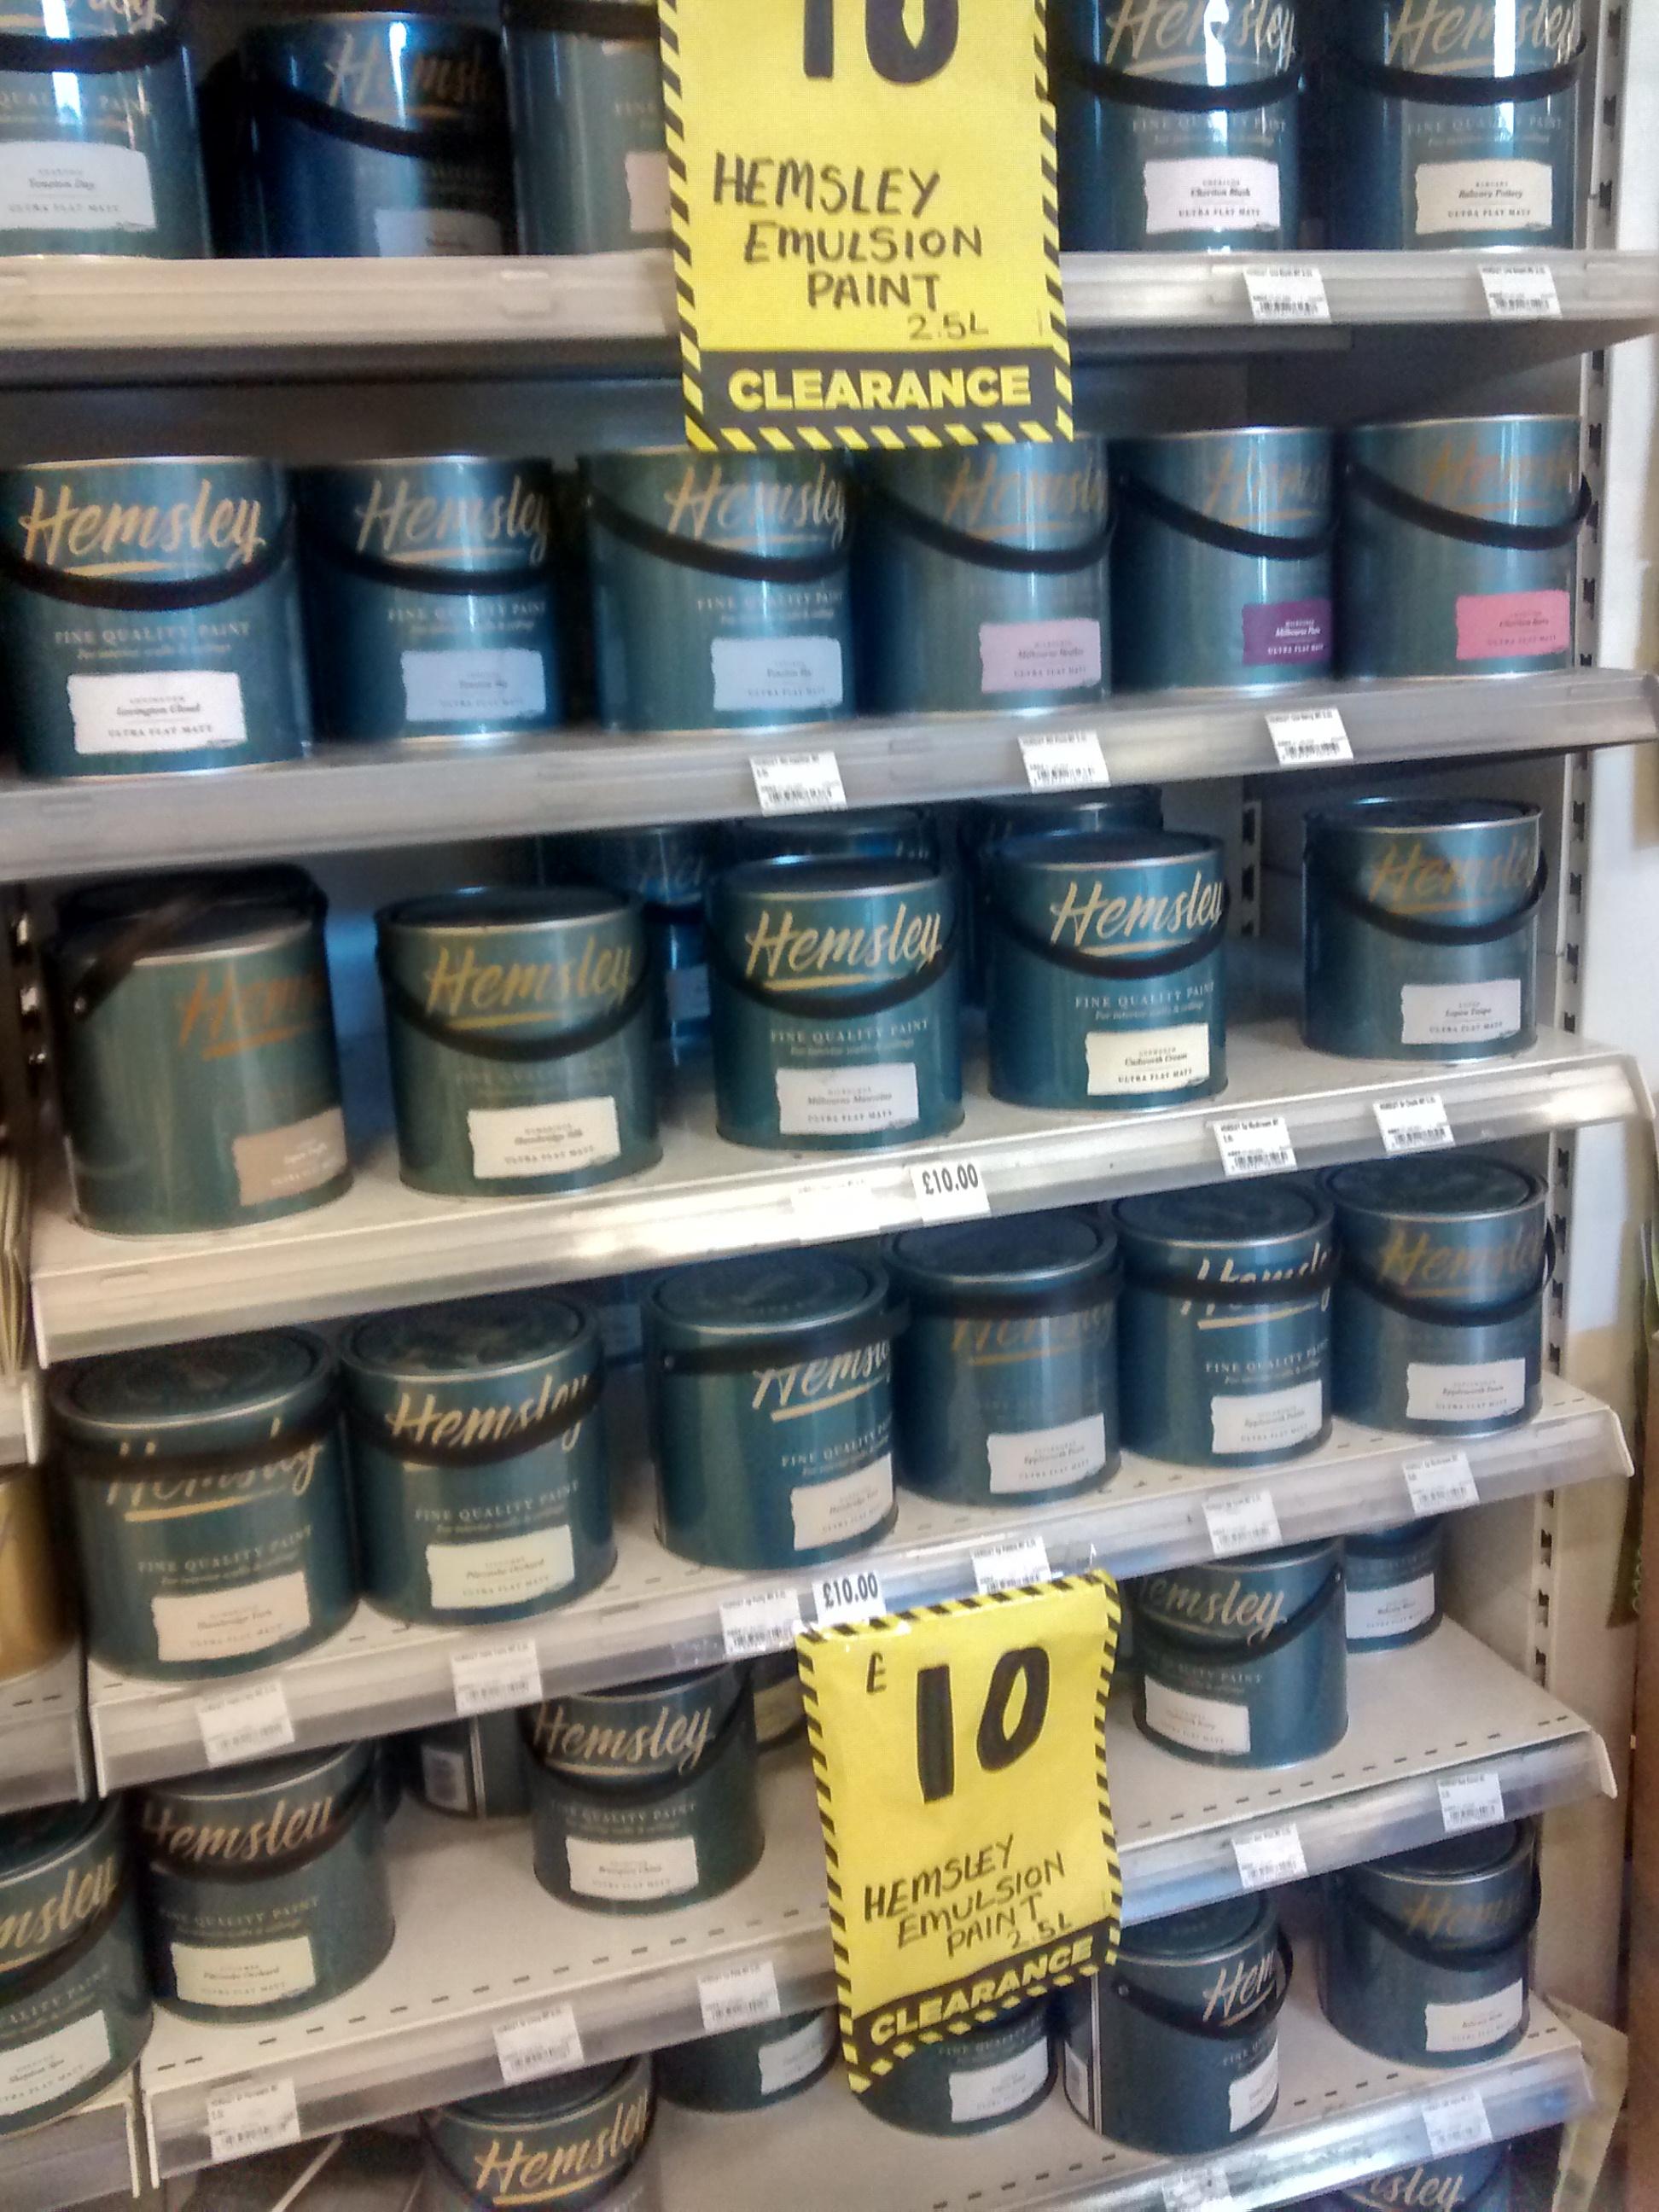 Hemsley Paint Homebase Half Price - £10 2.5L - Good quality Farrow and Ball alternative